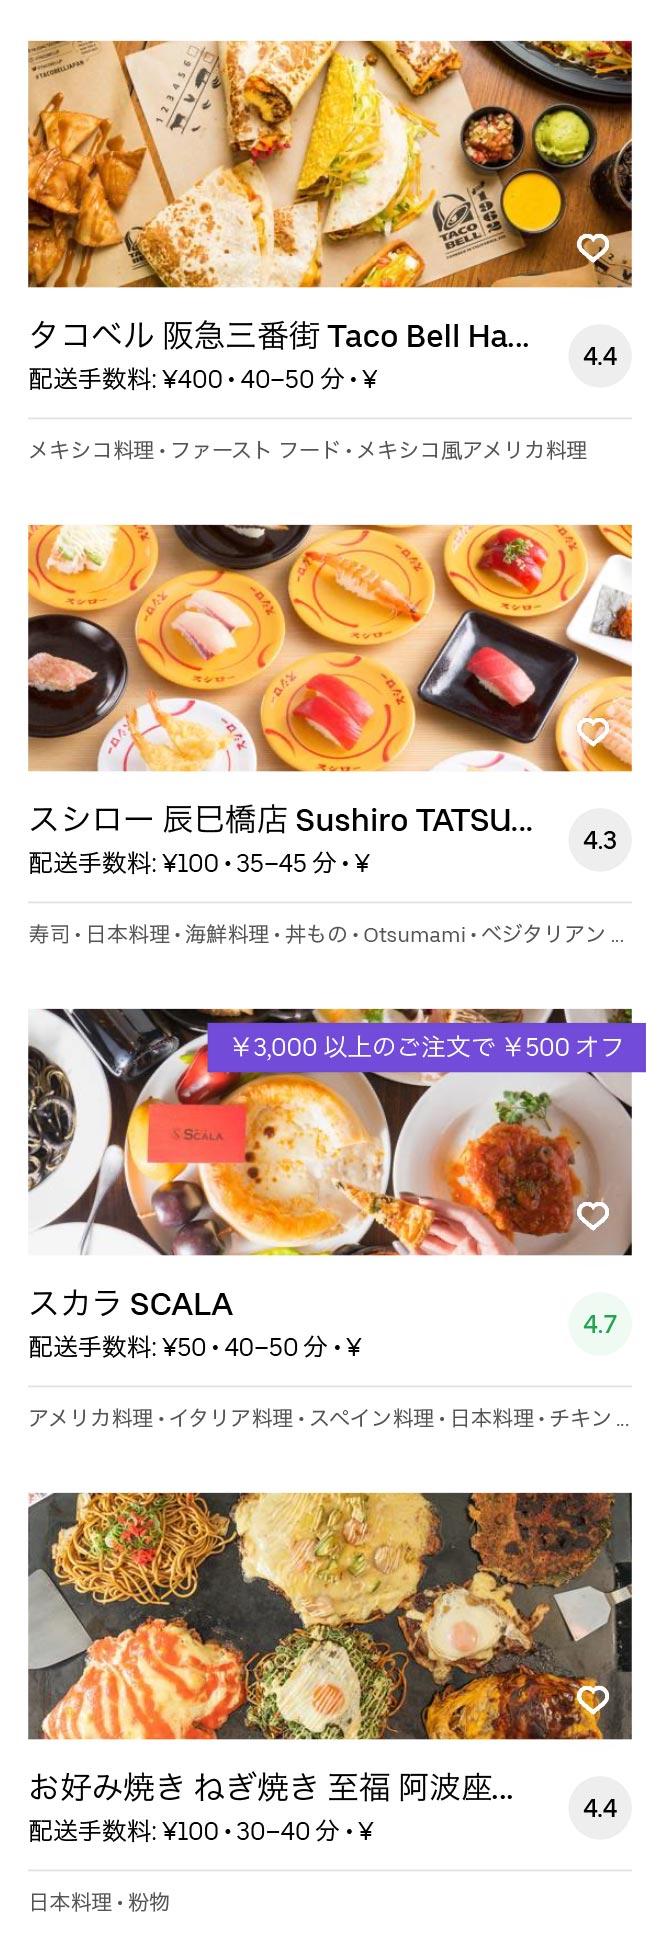 Osaka nishi kujo menu 2005 07